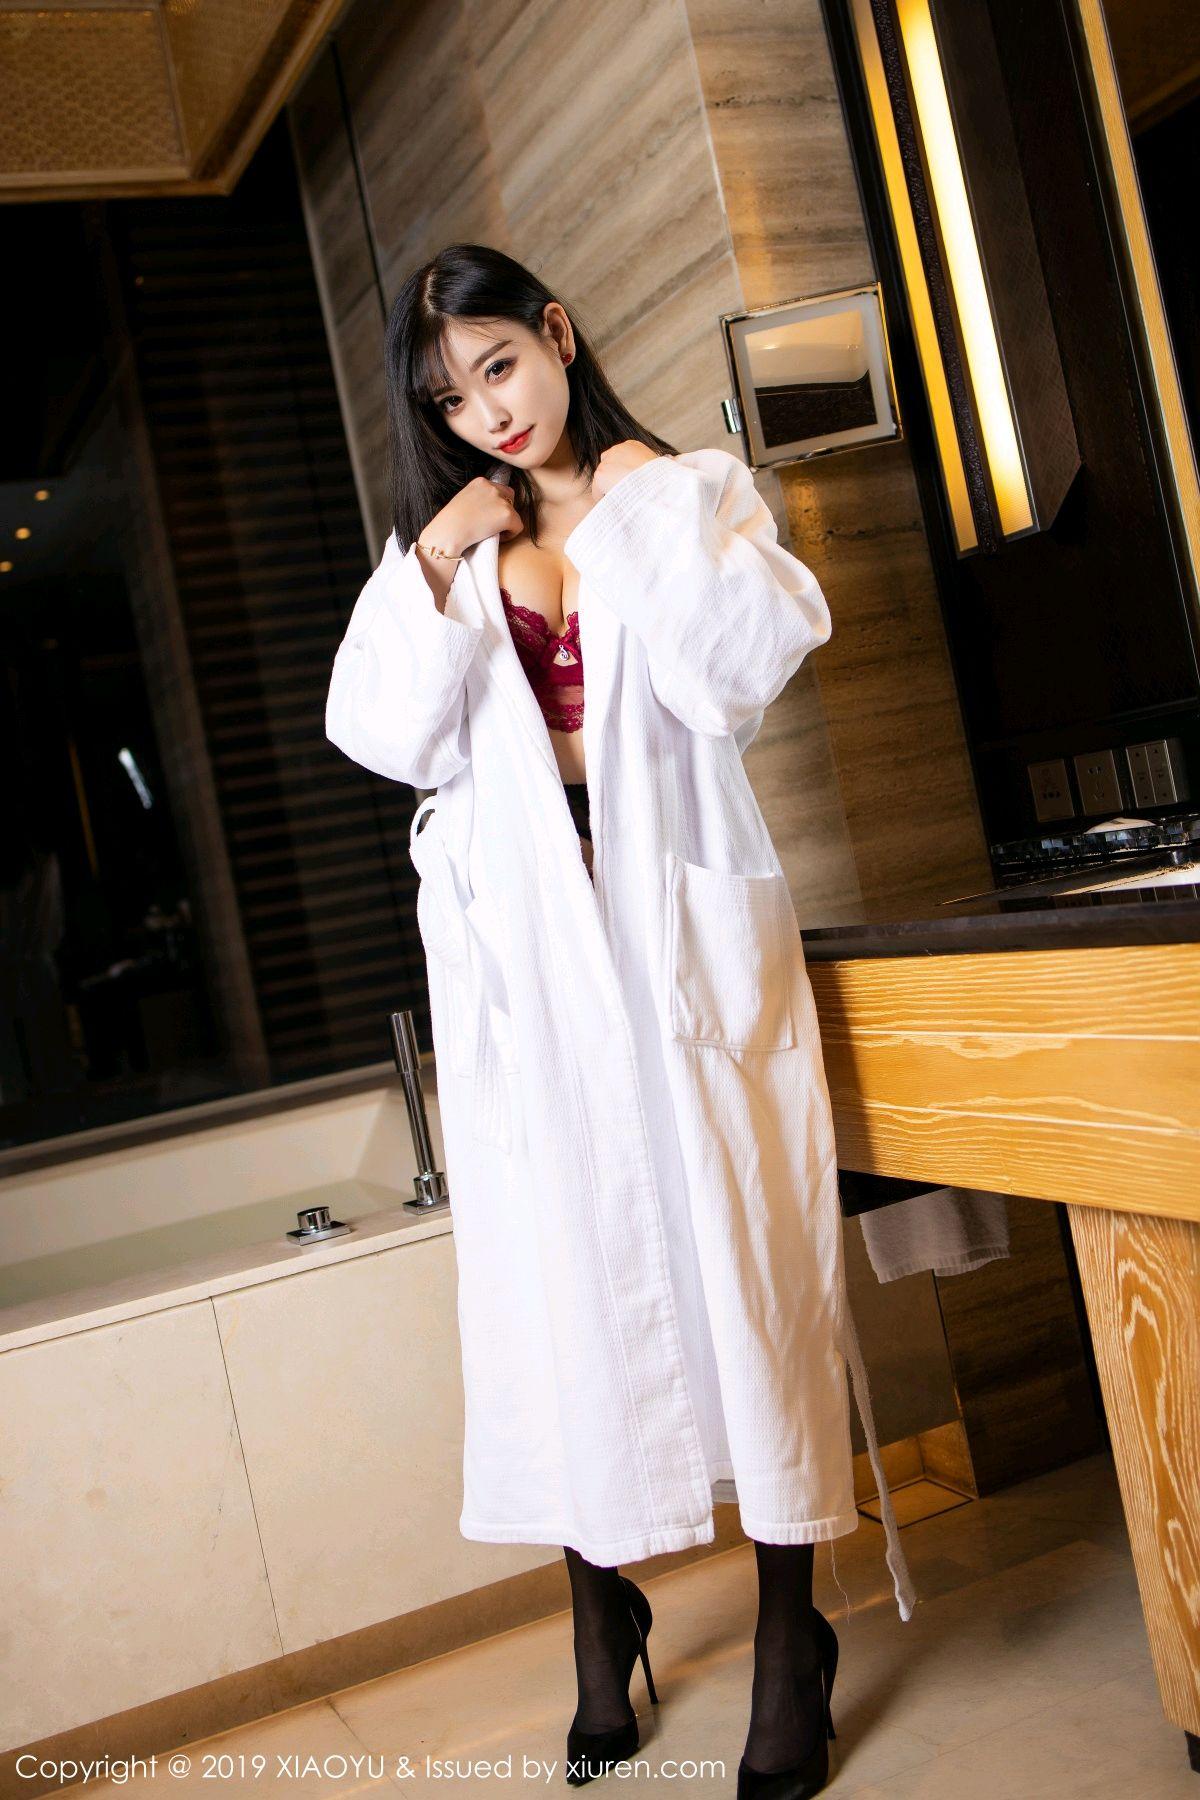 [XiaoYu] Vol.153 Yang Chen Chen 9P, Bathroom, Black Silk, Underwear, XiaoYu, Yang Chen Chen